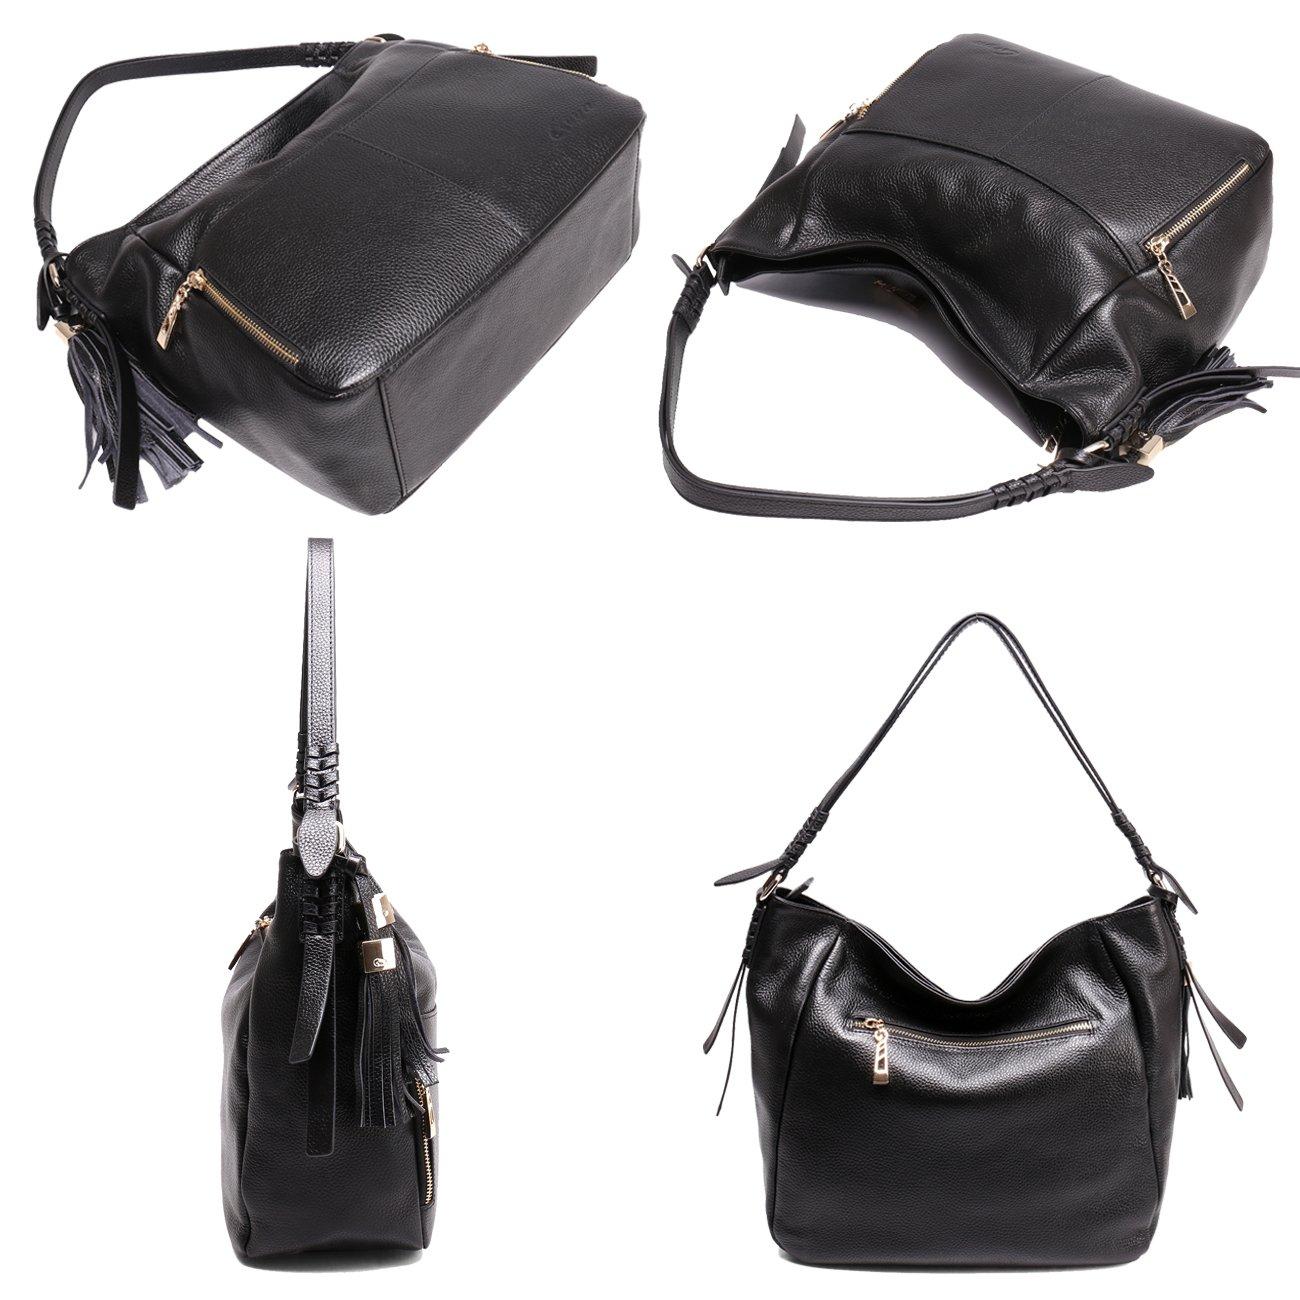 Geya Women's Fashion Genuine Leather Handbag Shoulder Handbag with Imported Soft Hot Leather (Black) by Geya (Image #7)